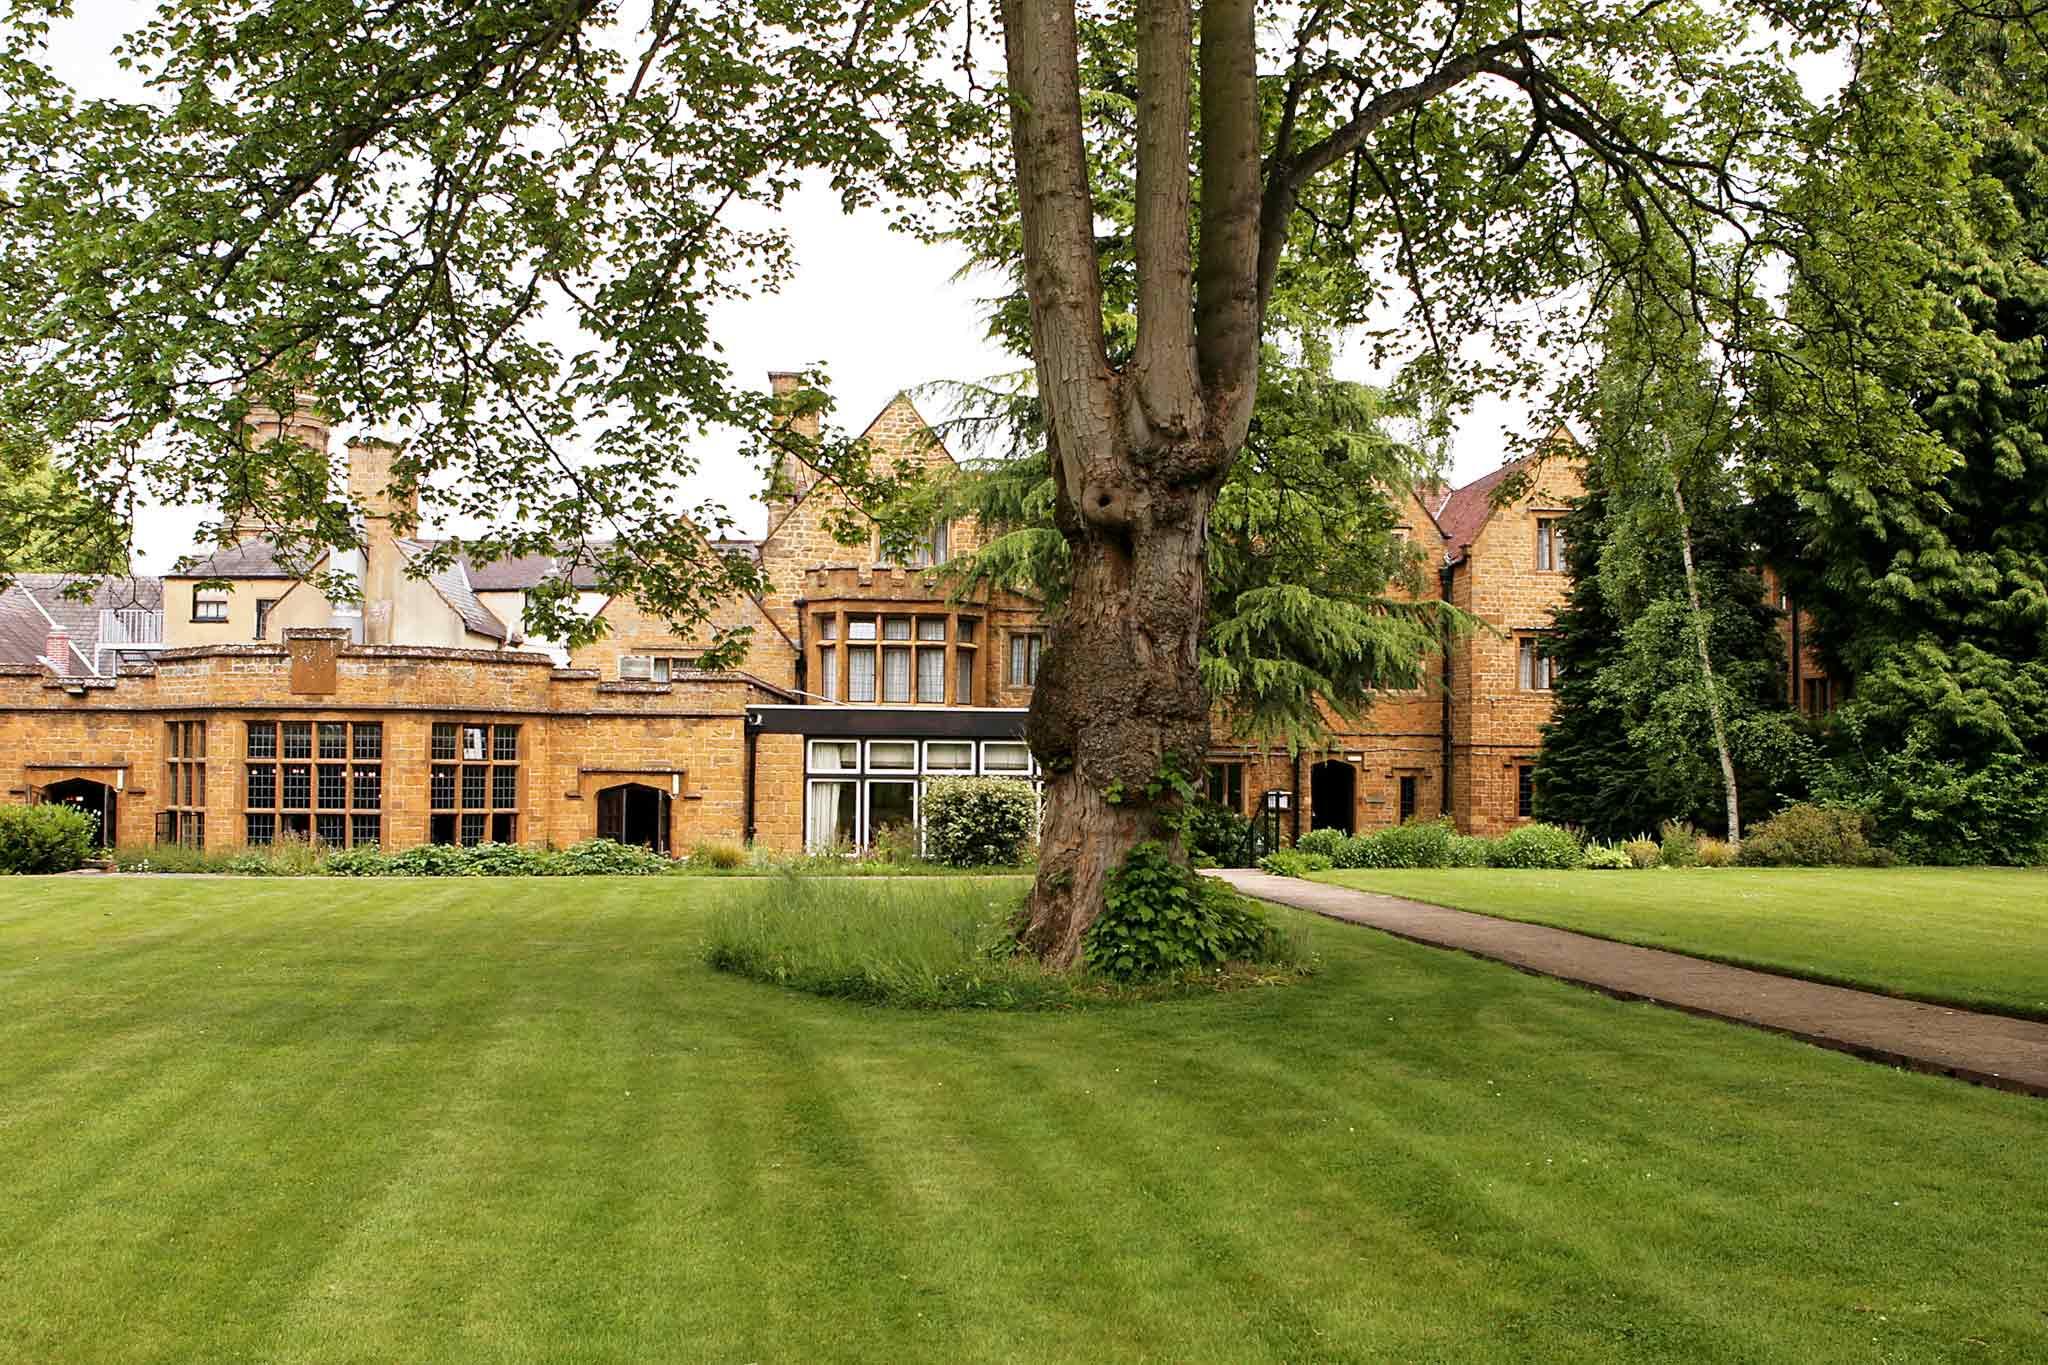 Hotel Mercure Banbury Wly Hall